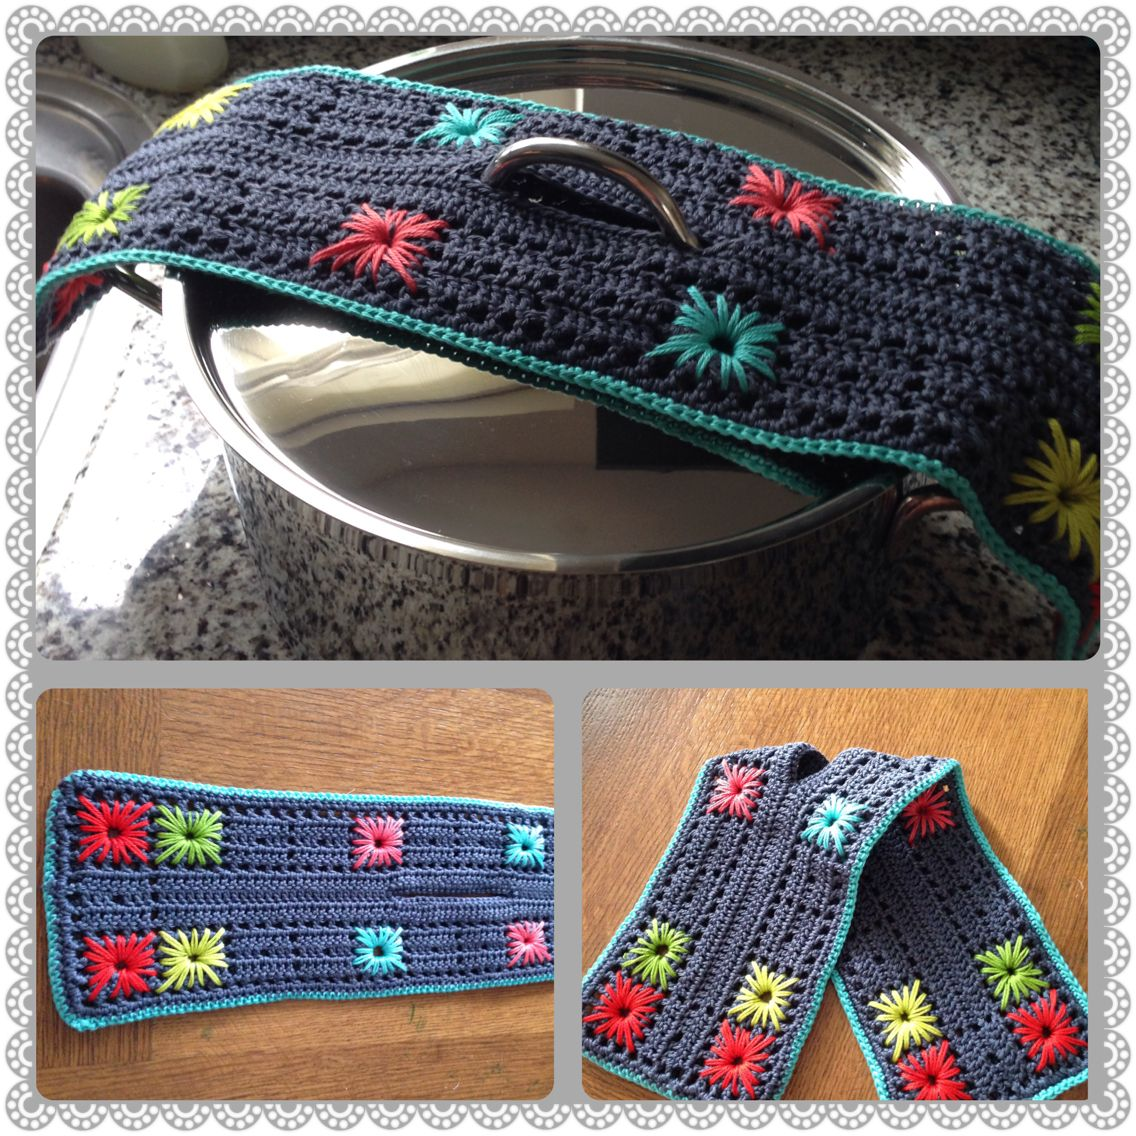 Lange Pannenlap Haken Pinterest Crochet Crochet Home And Knit